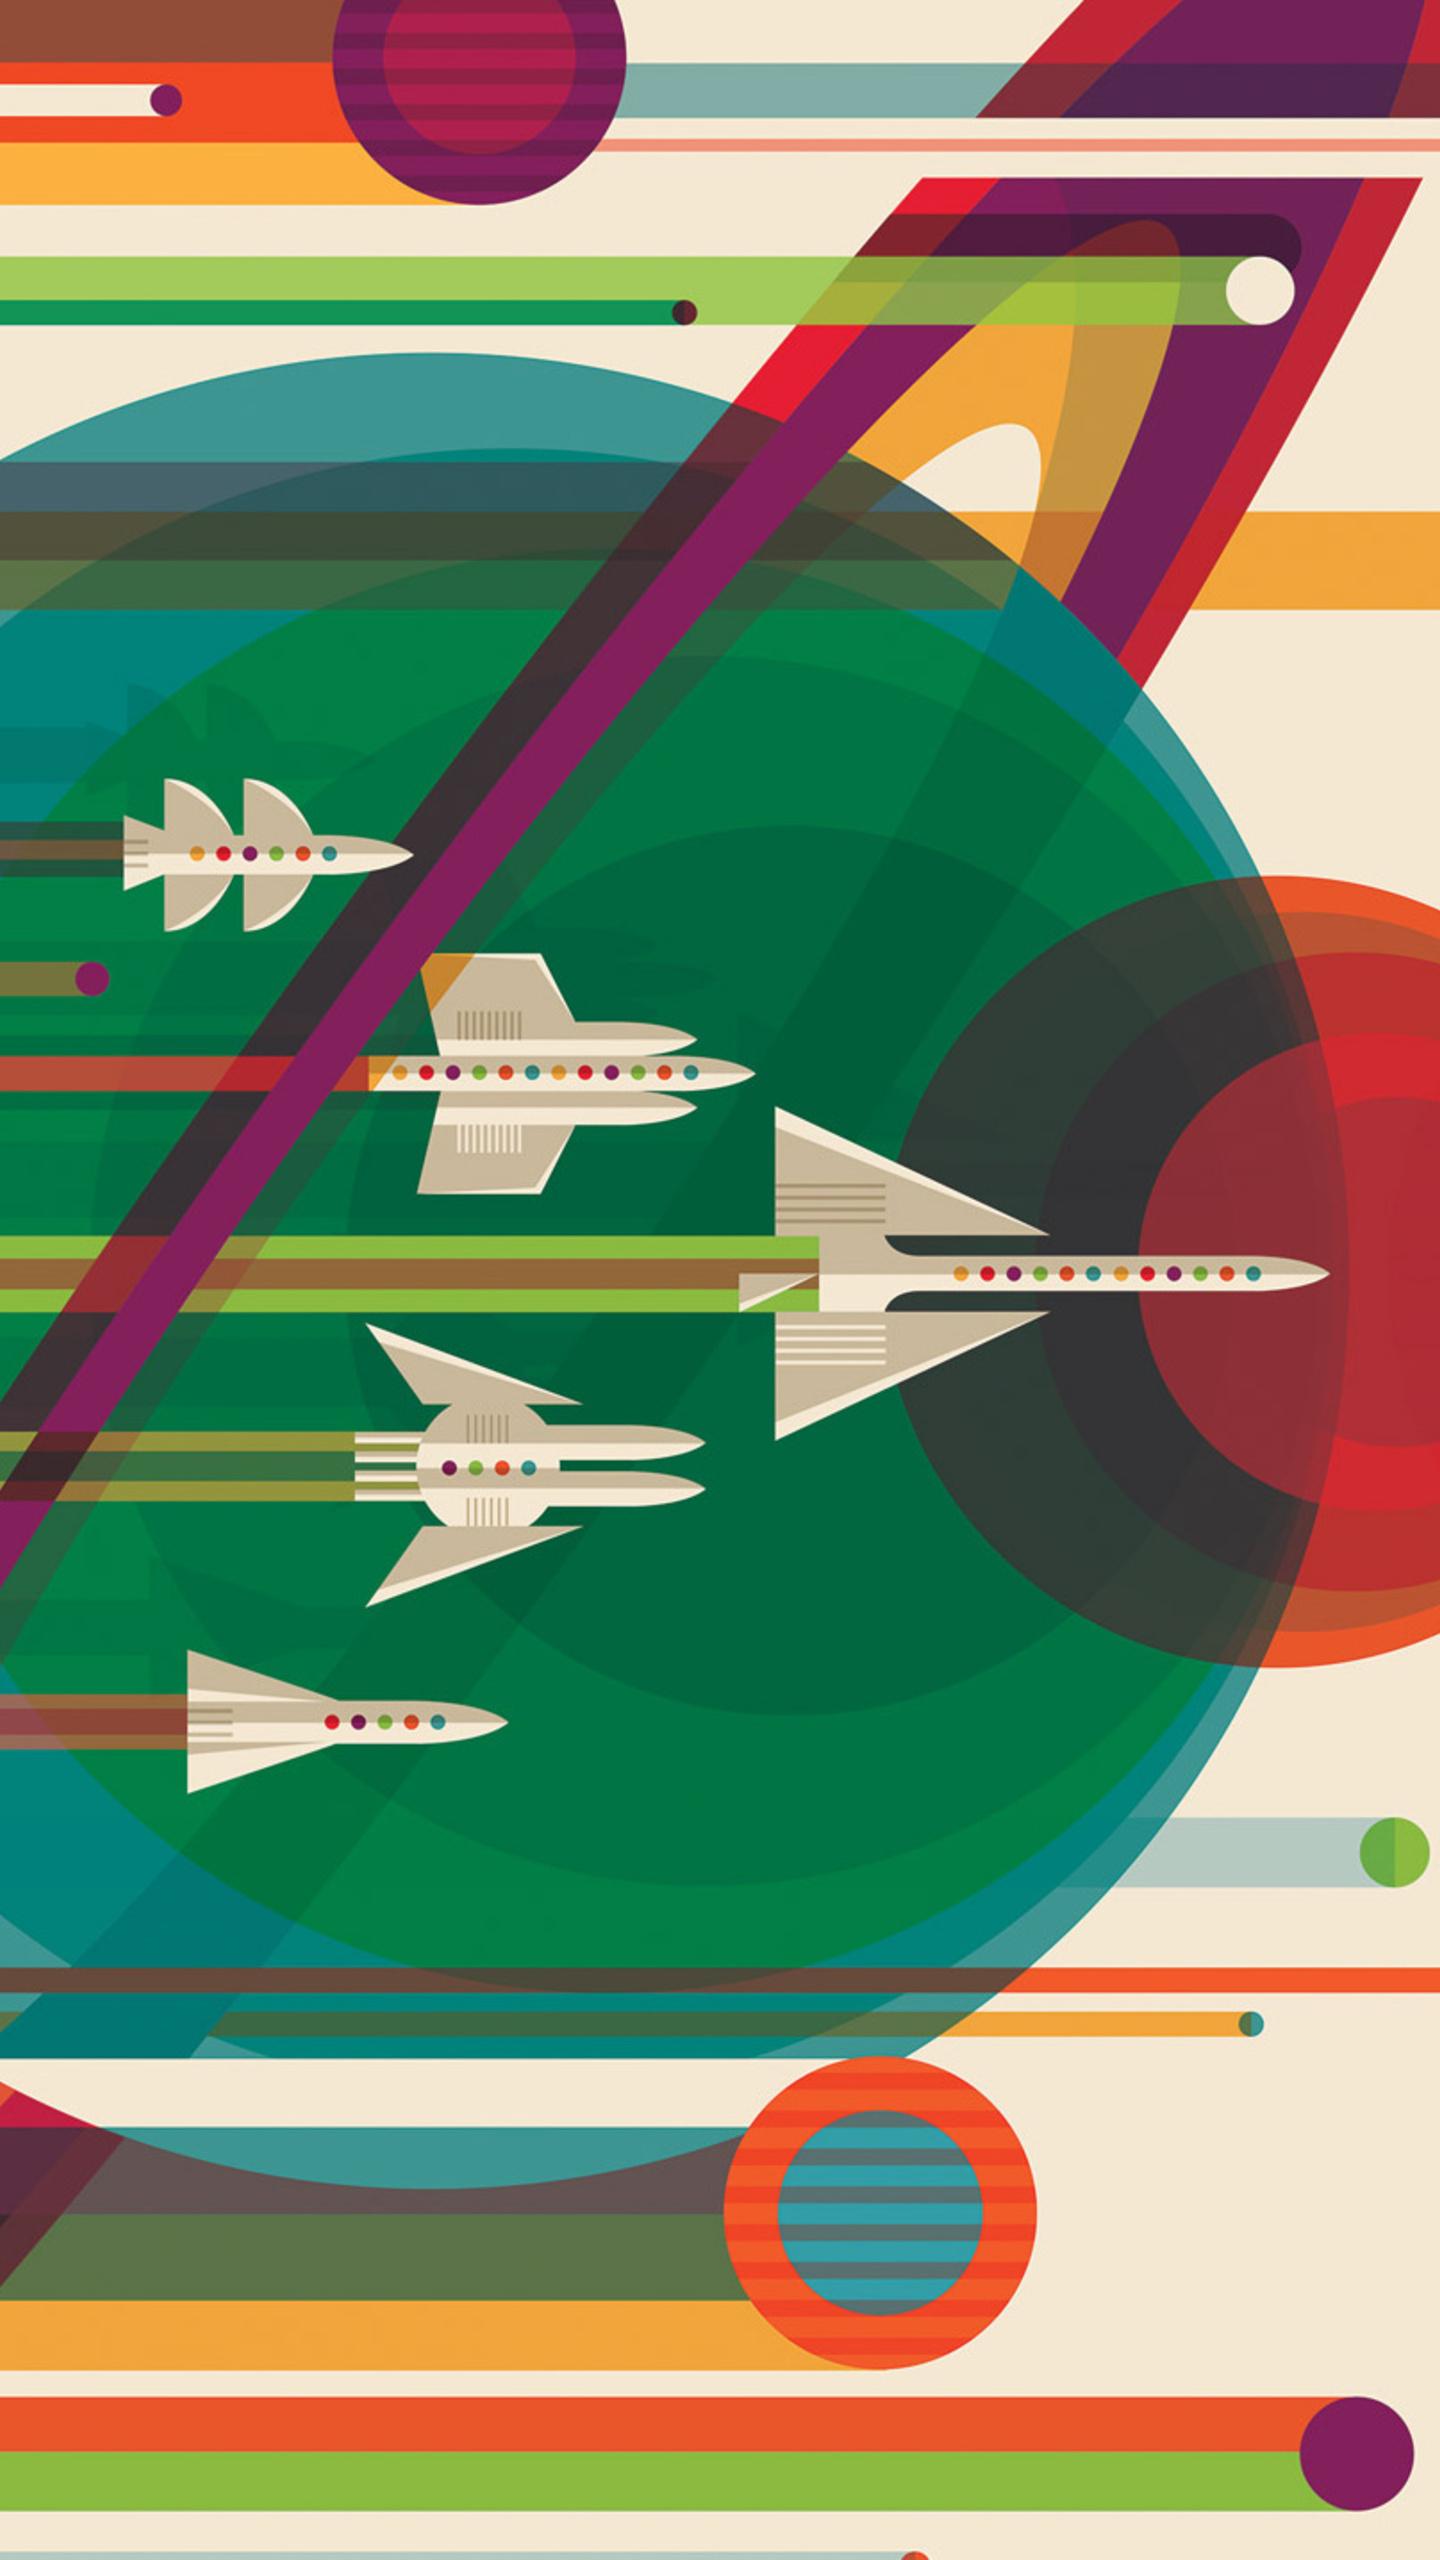 spaceship-vector-solar-system-planets-planes-sci-fi-artistic-hu.jpg